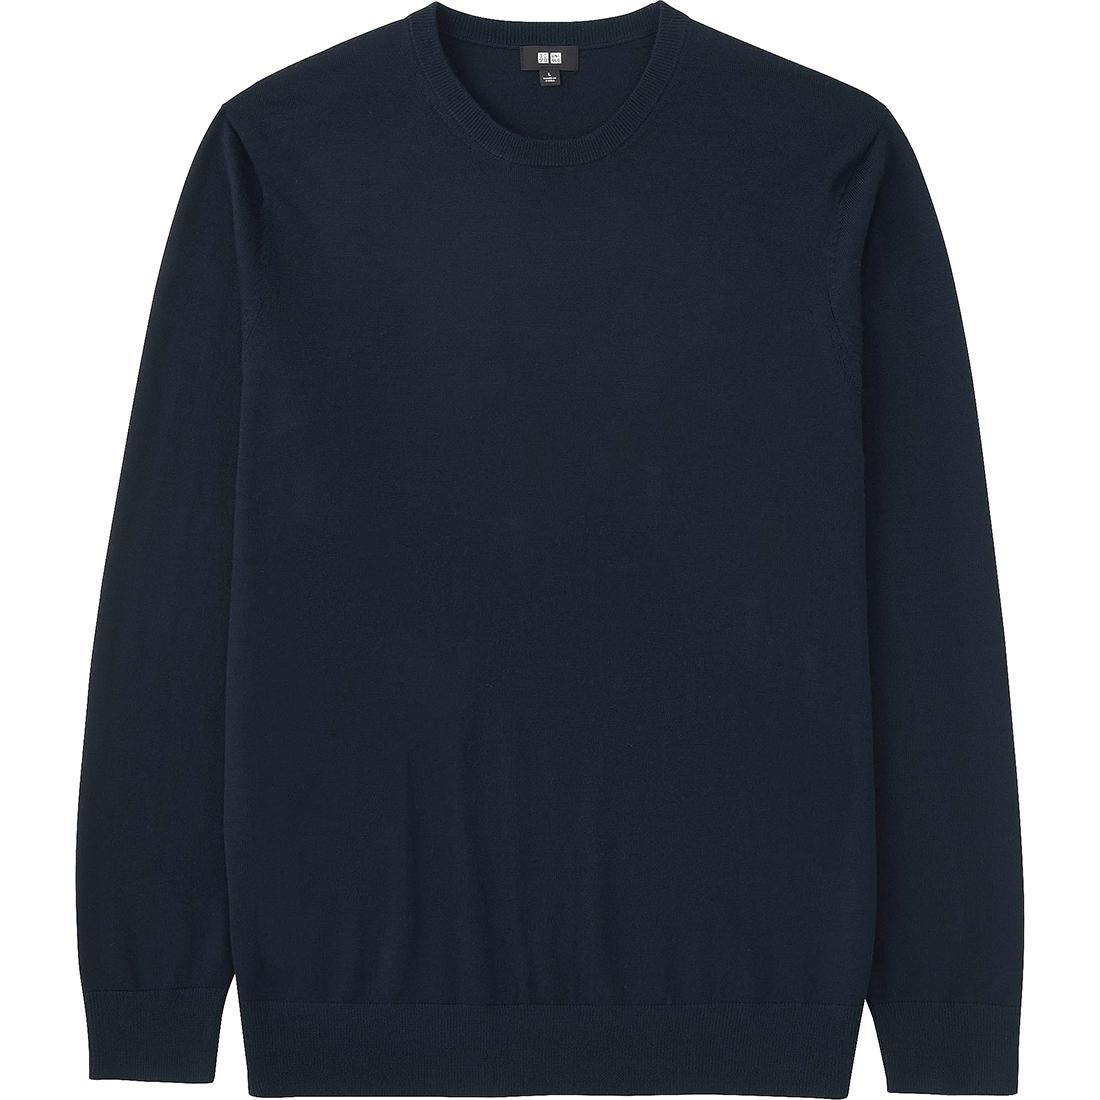 uniqlo-merino-crew-neck-sweater